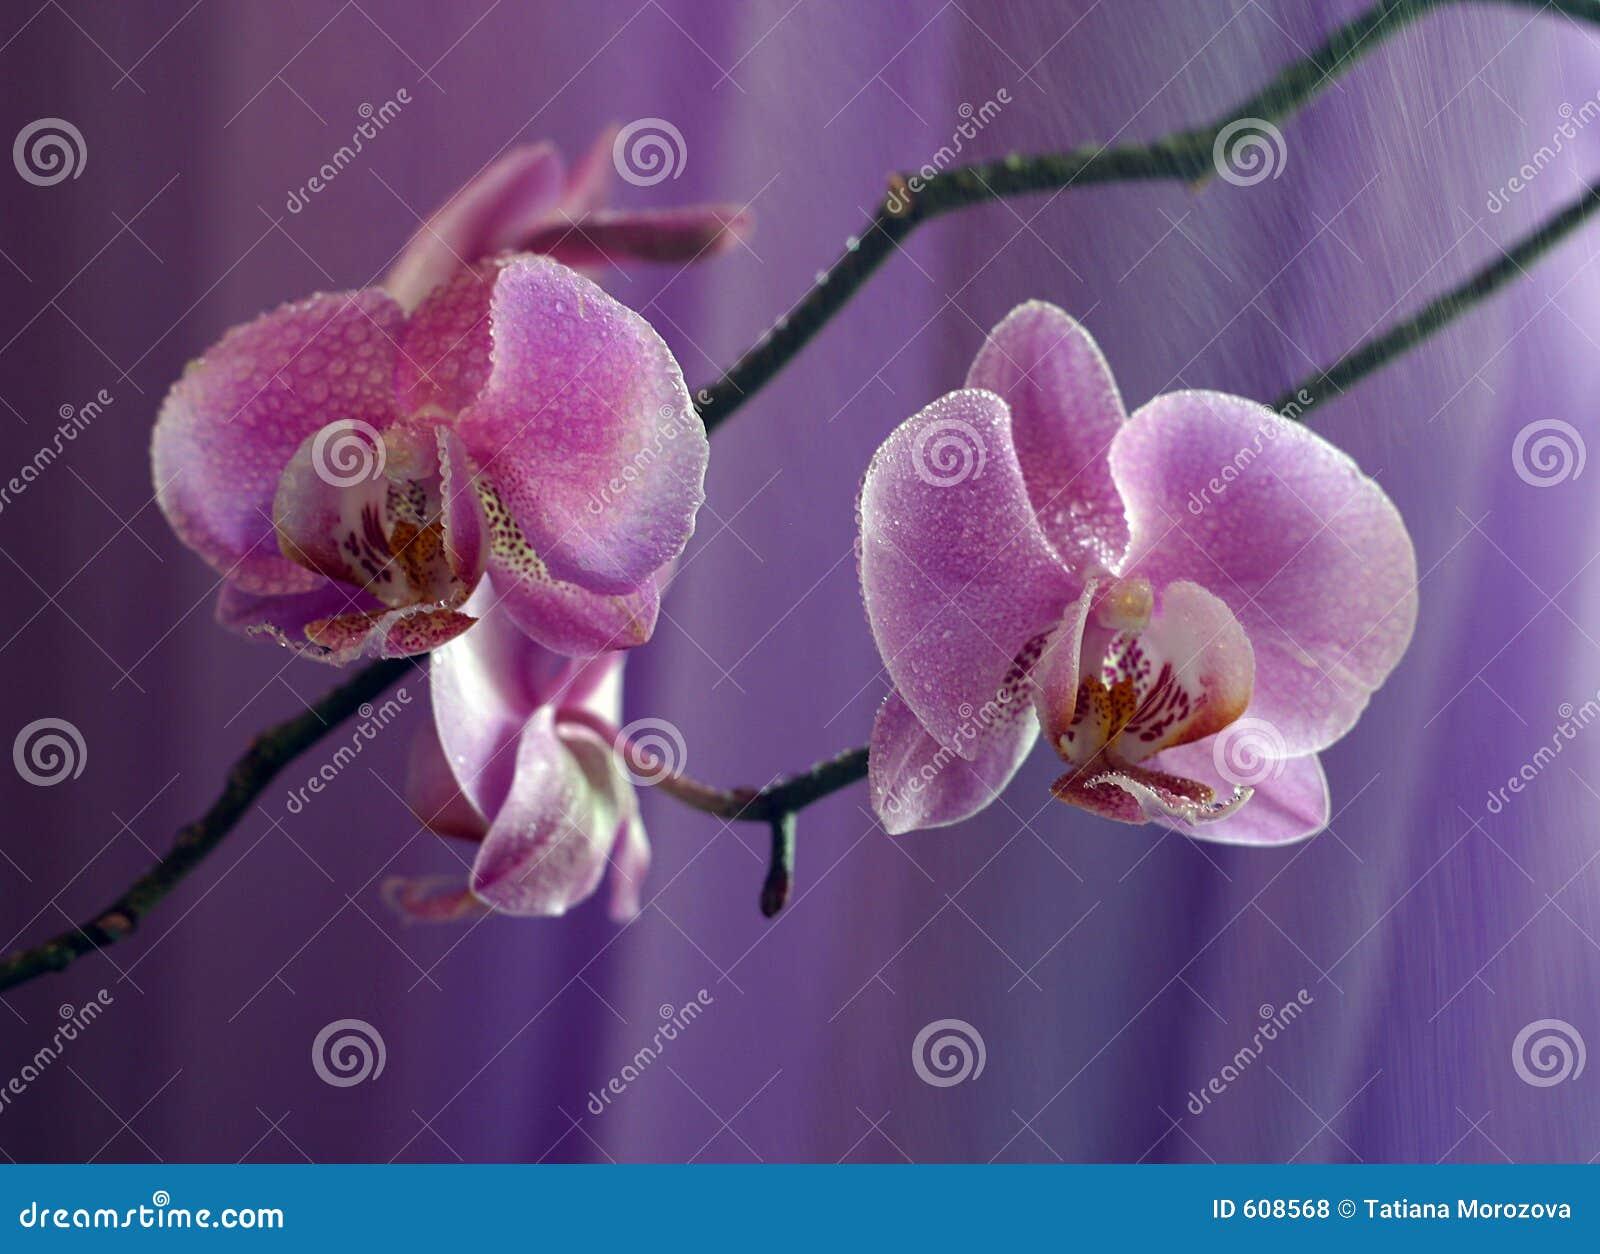 Orchidee - 3